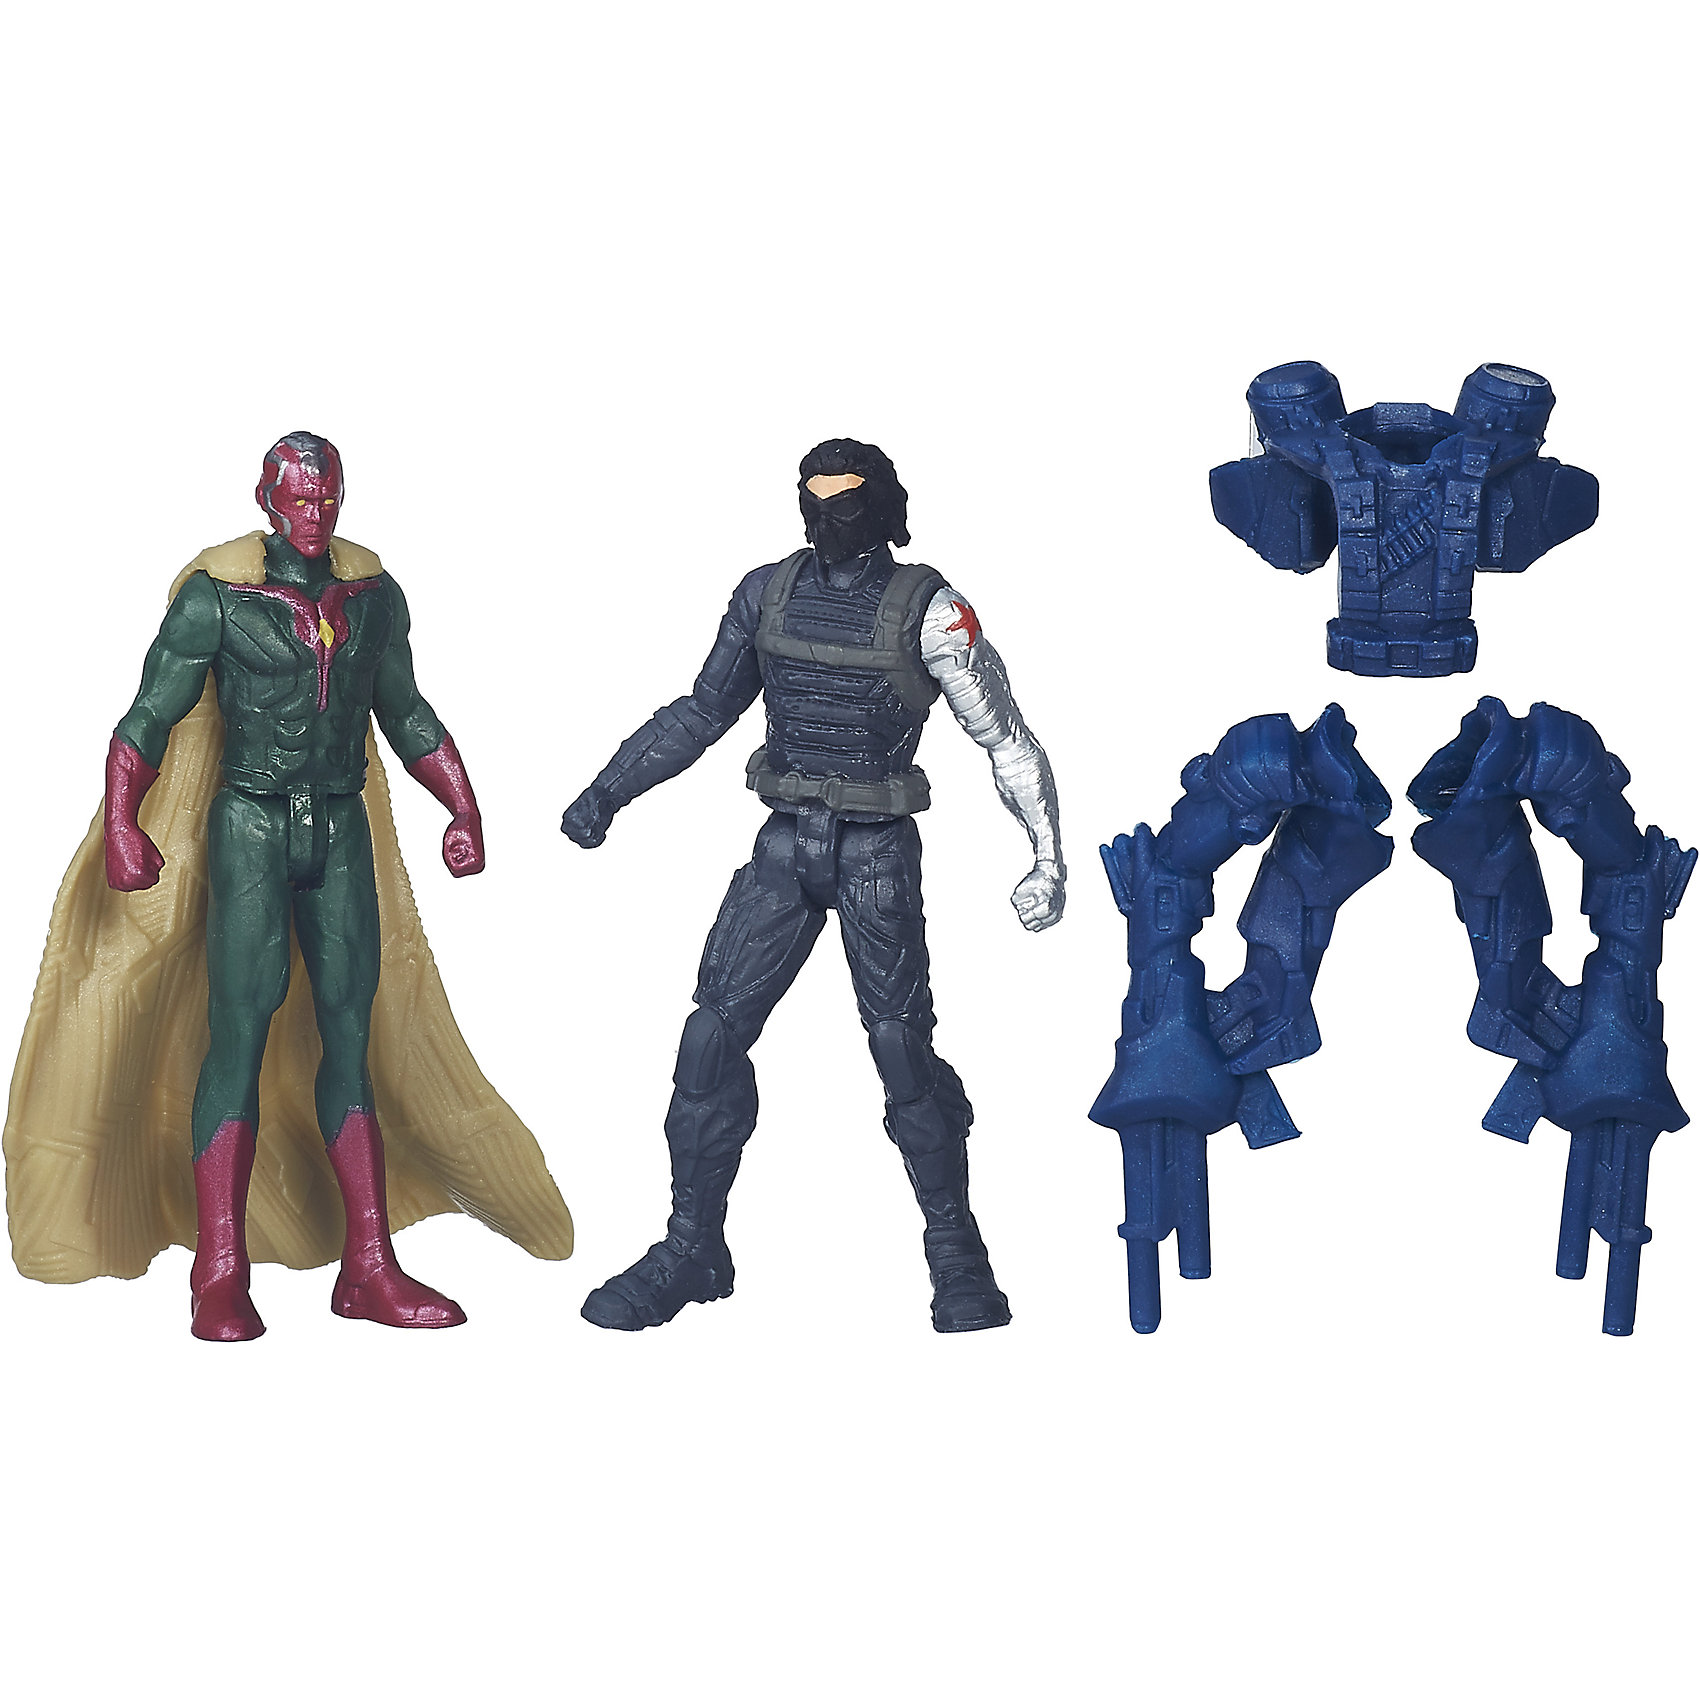 Hasbro Набор из 2 фигурок Мстителей Vision vs Winter Solder фигурки игрушки hasbro набор микро фигурок марвел